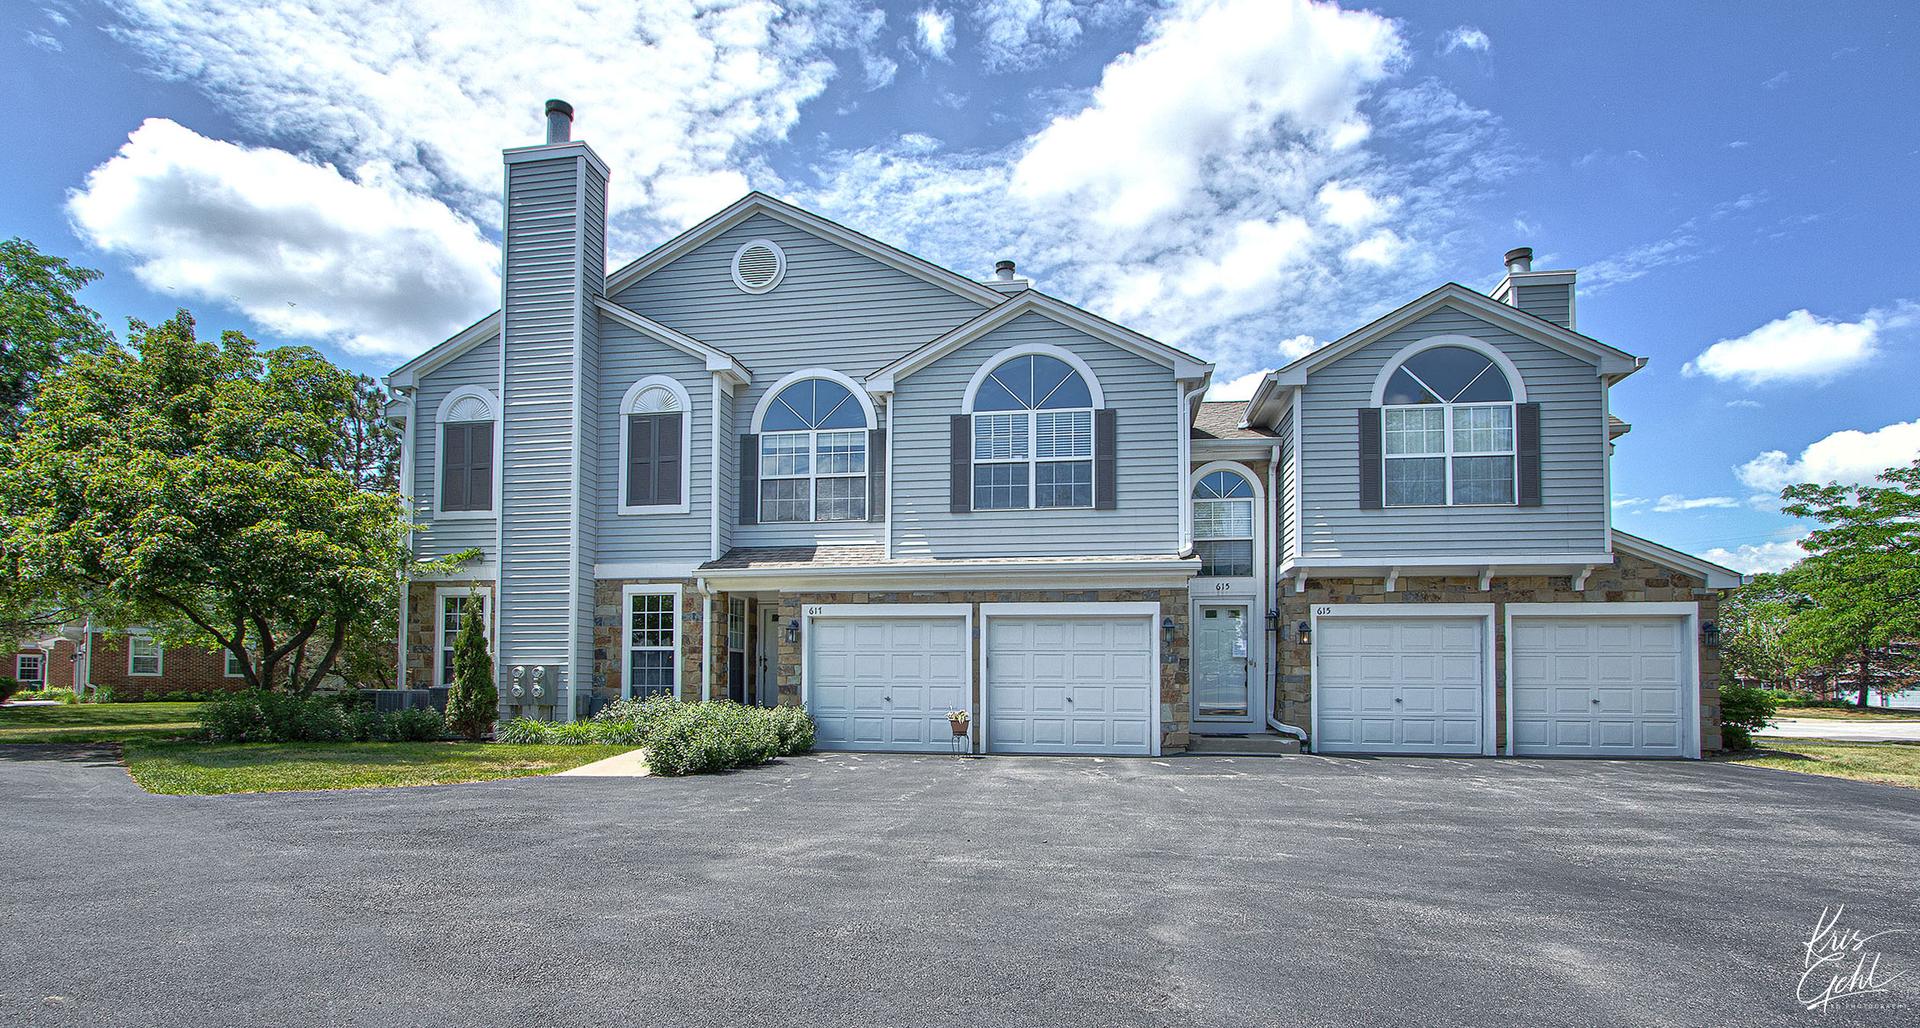 615 Grosse Pointe Circle, Unit 12-7, Vernon Hills, Il 60061